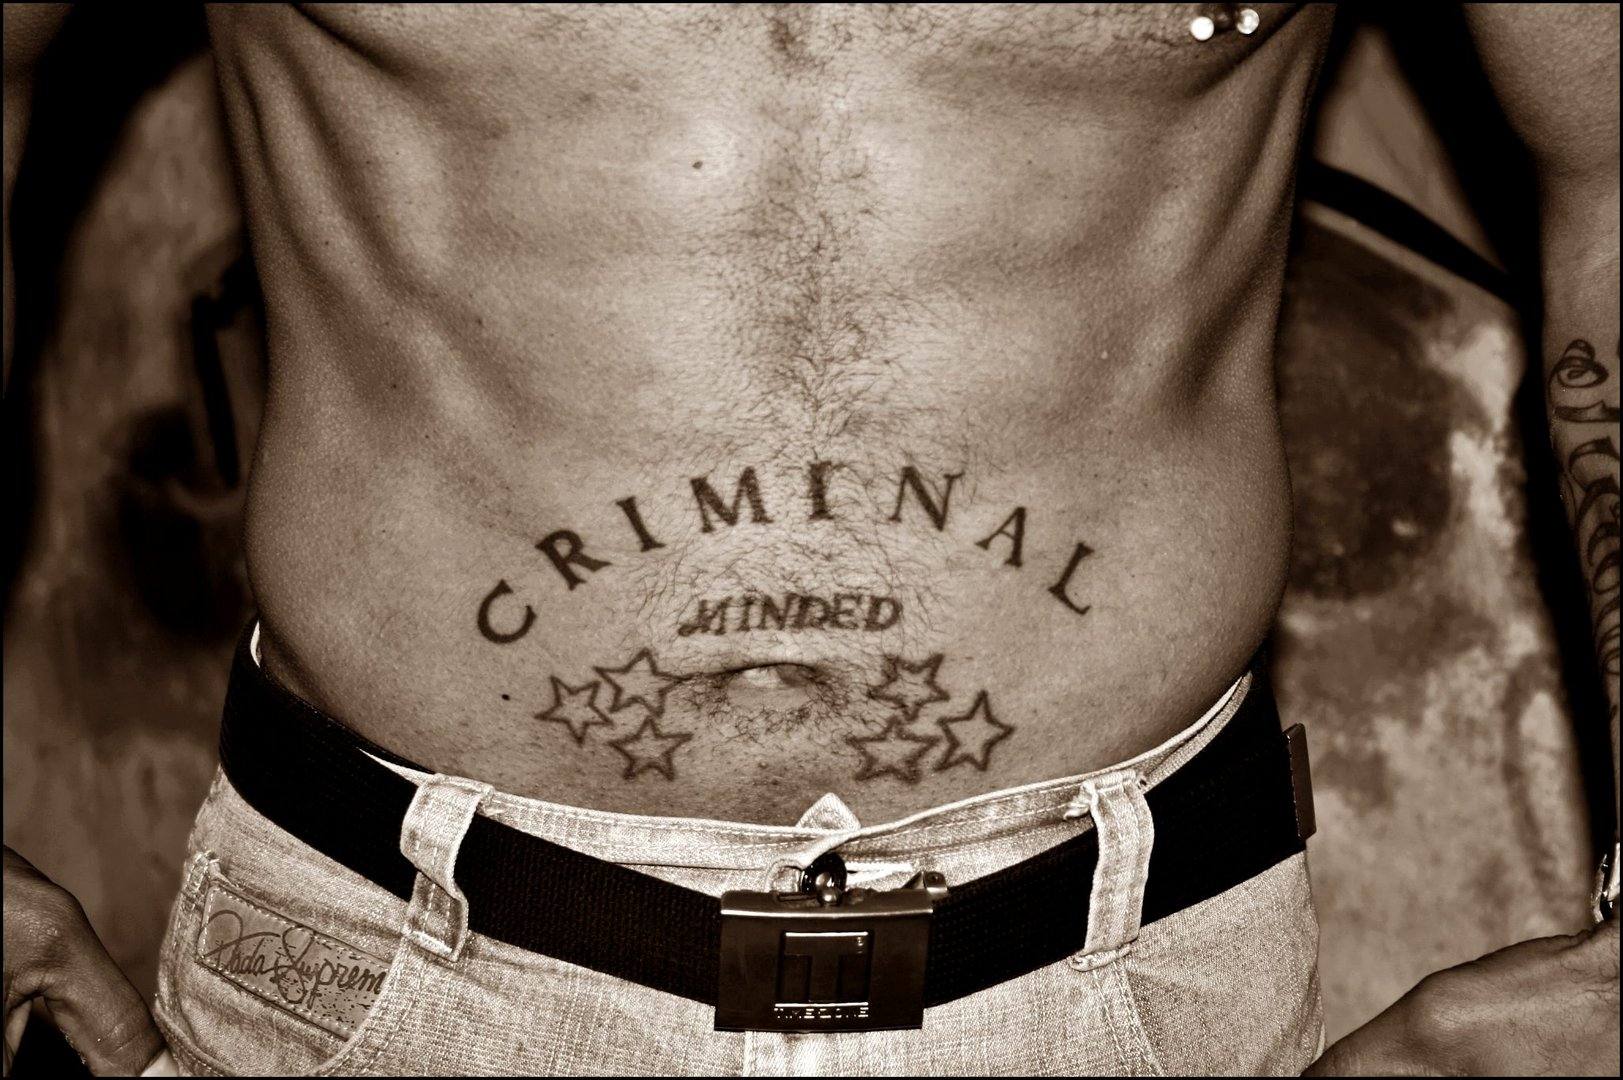 Real criminal